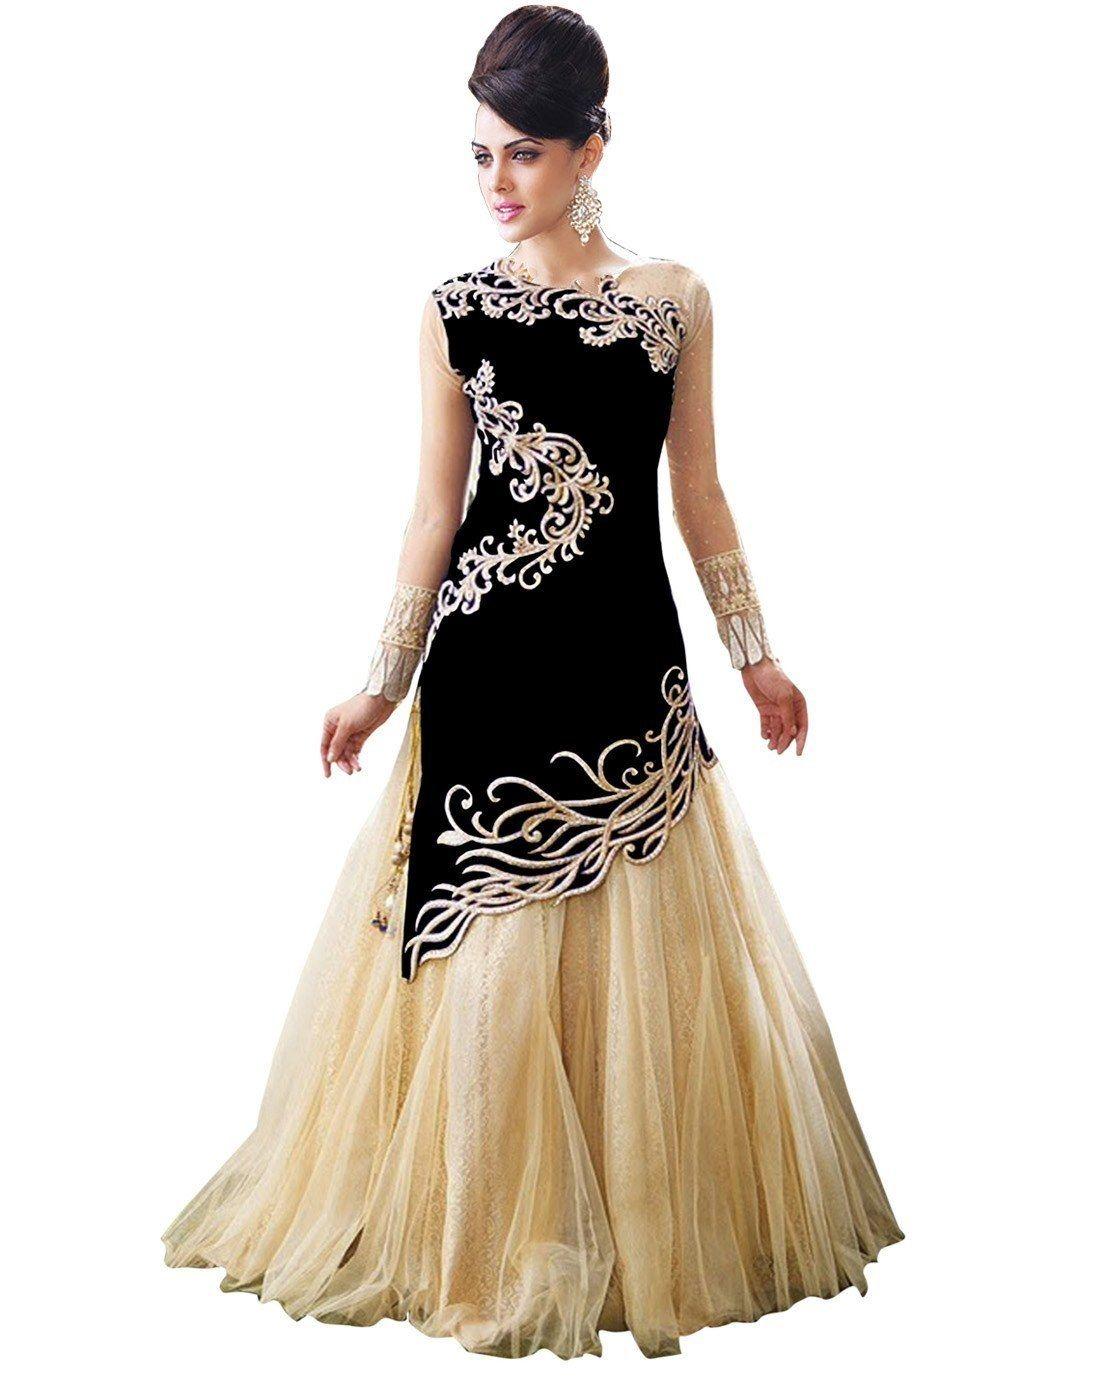 Craftsvilla dresses for wedding guests summer 2018